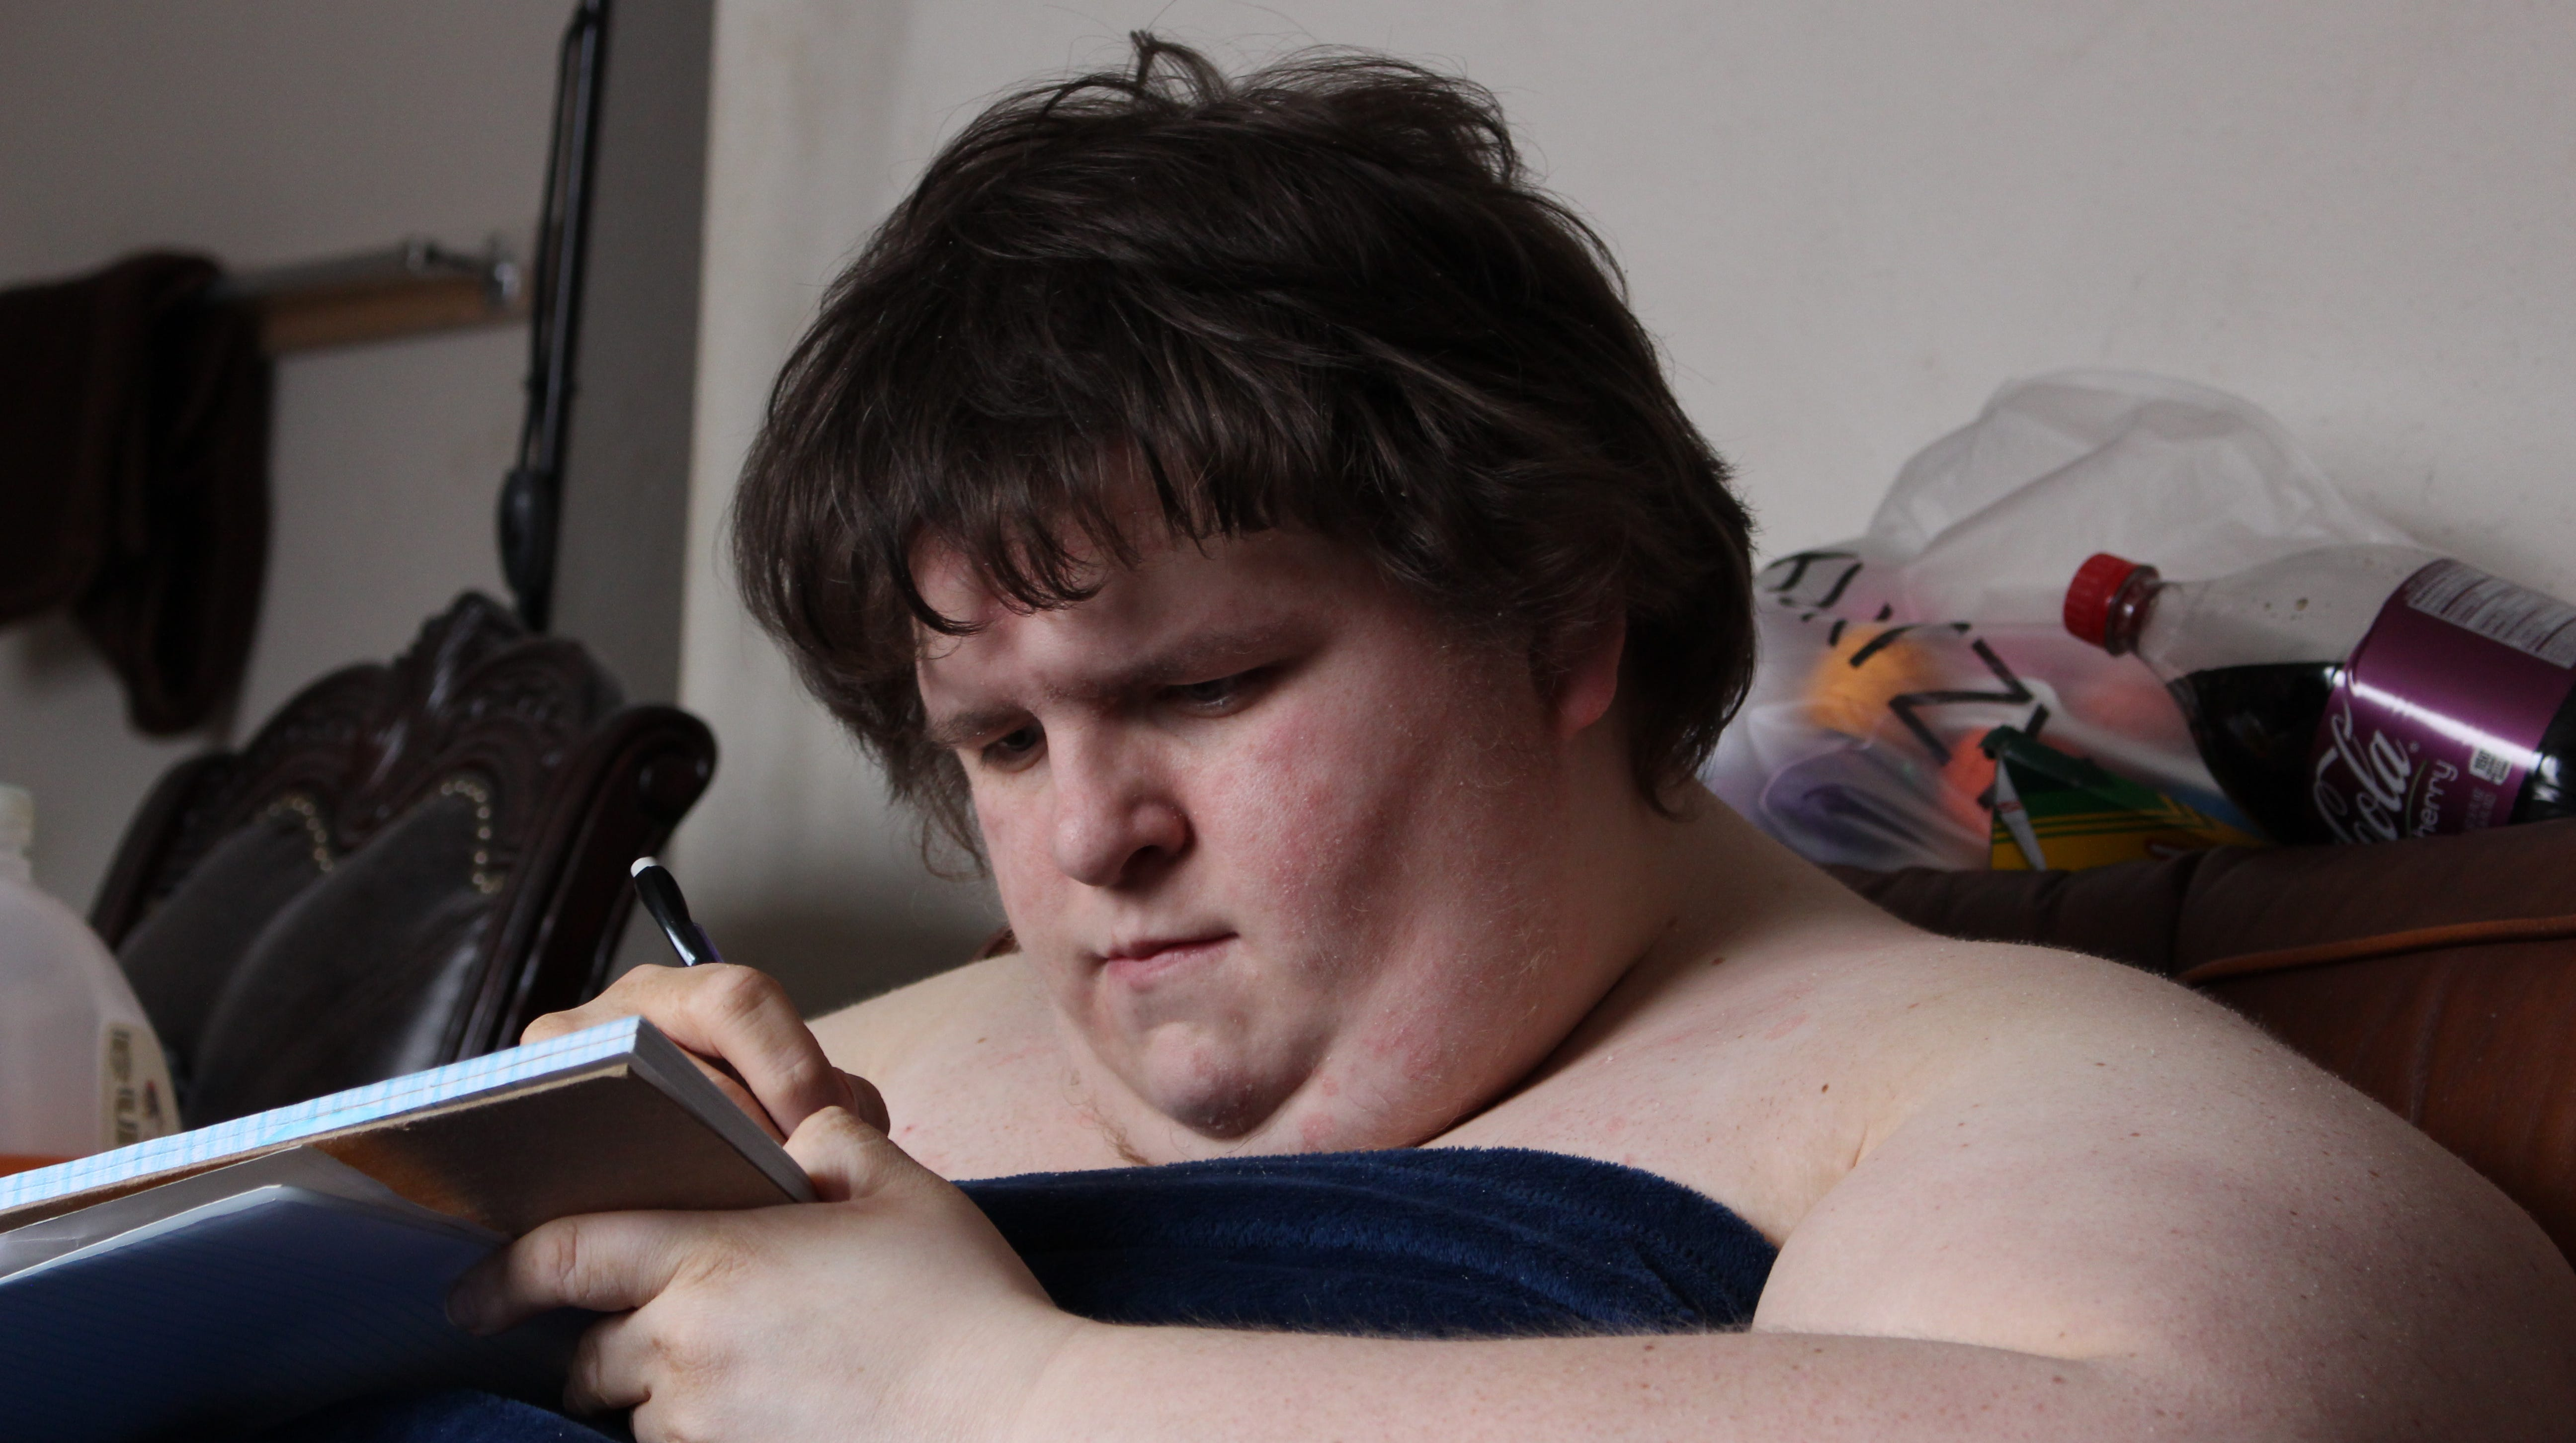 """My 600-lb Life"" star Sean Milliken has died."